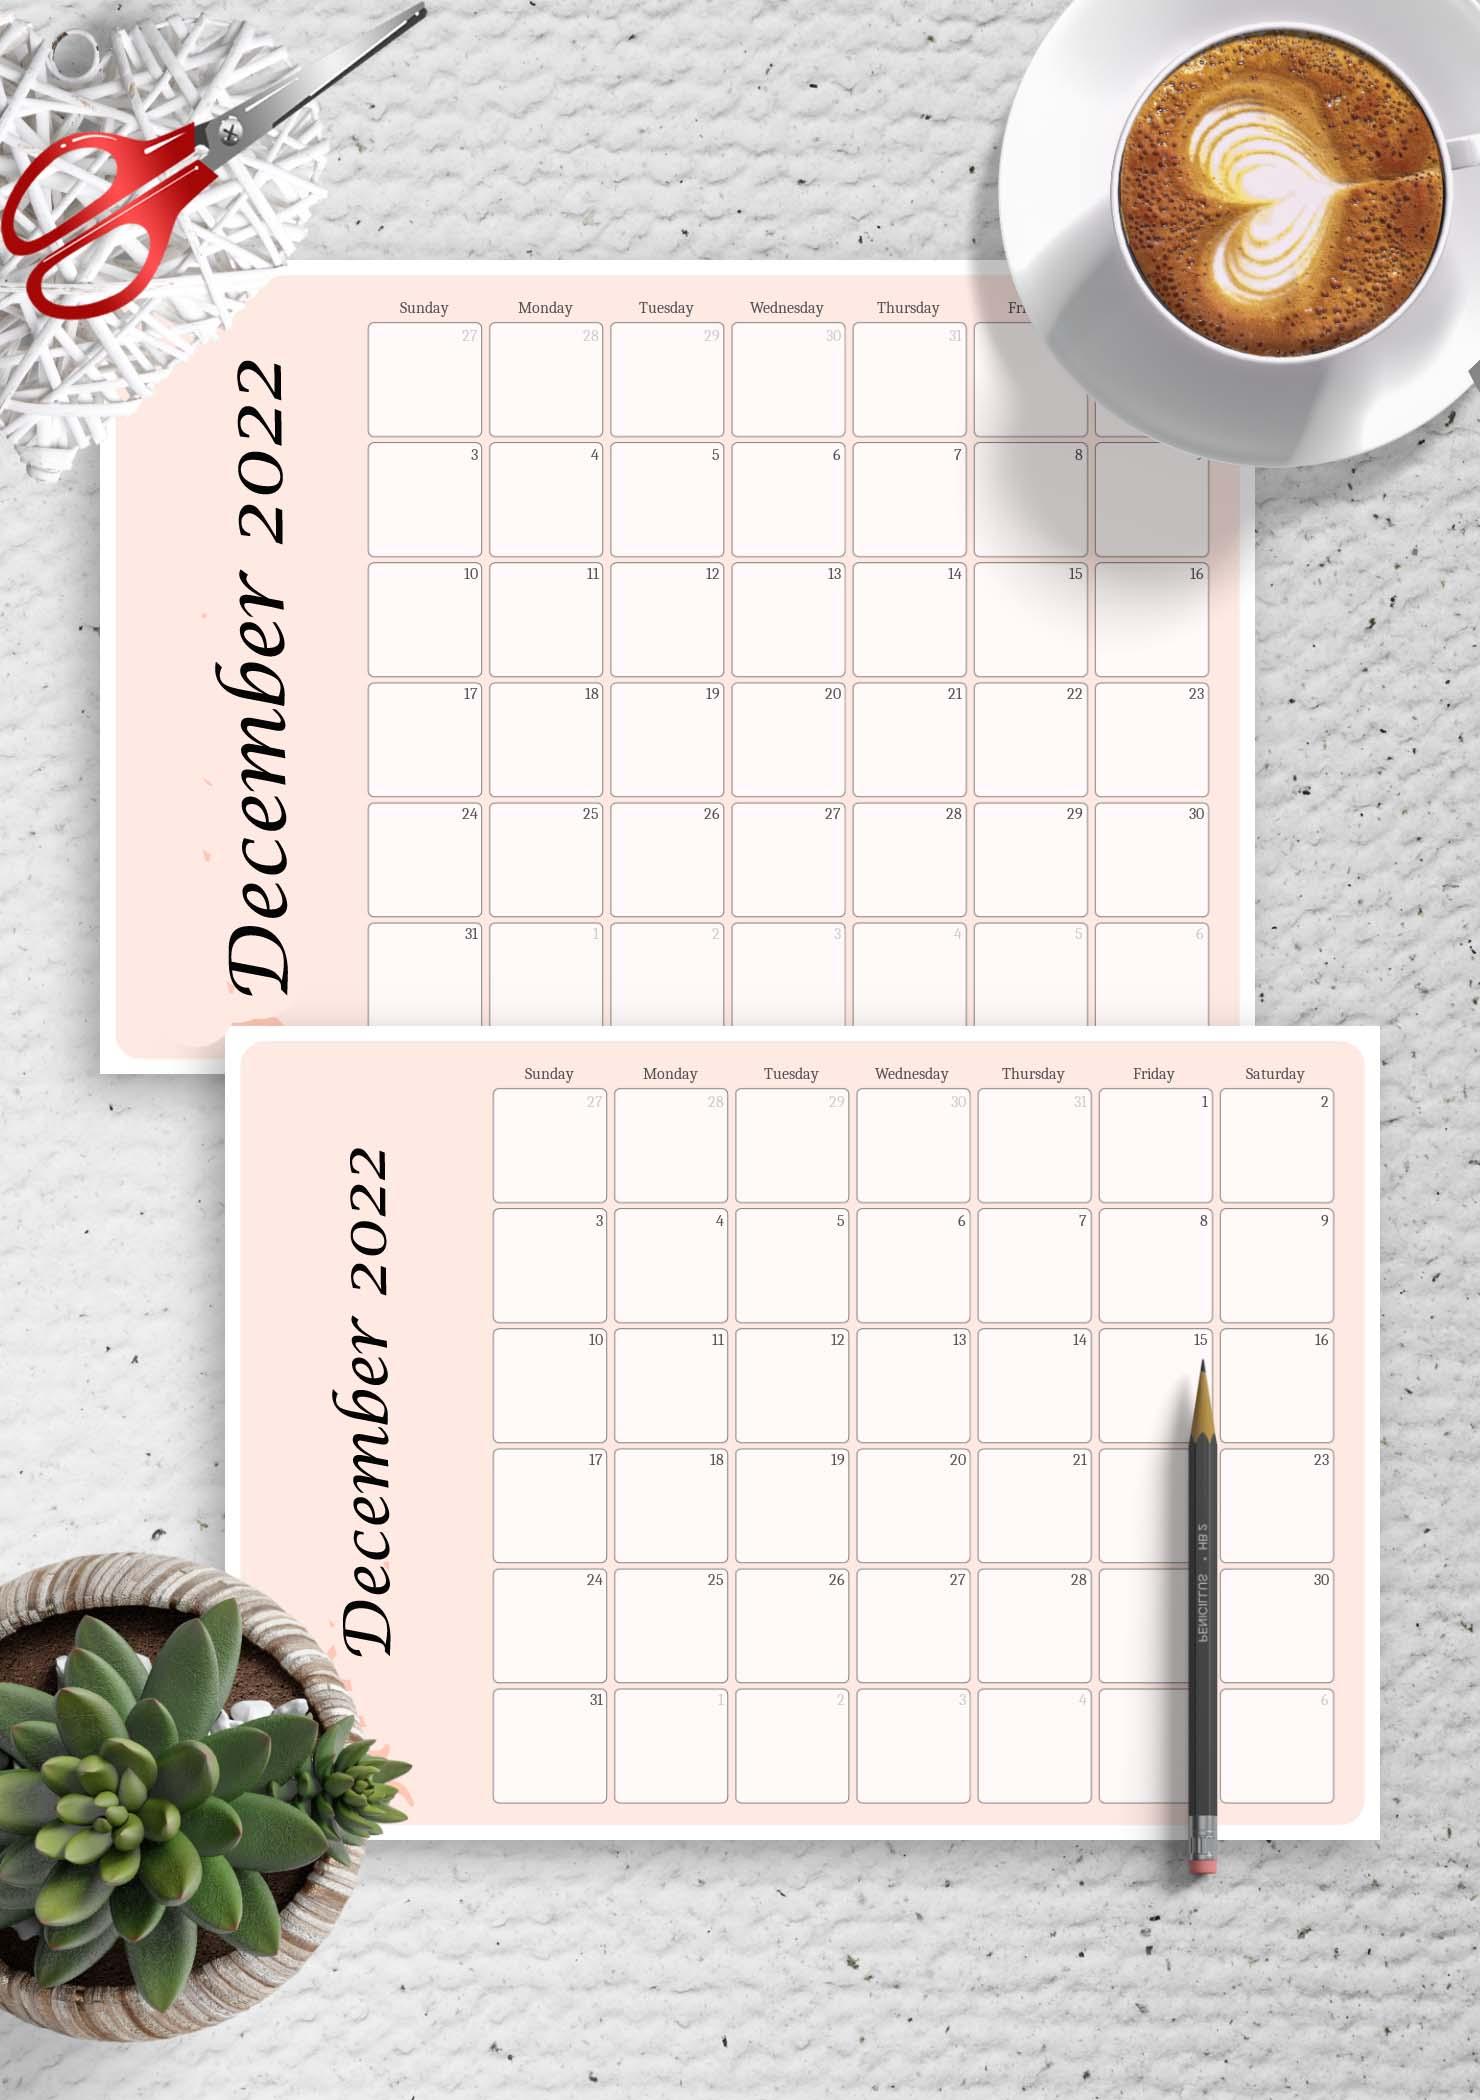 Printable Calendar December 2022 Template